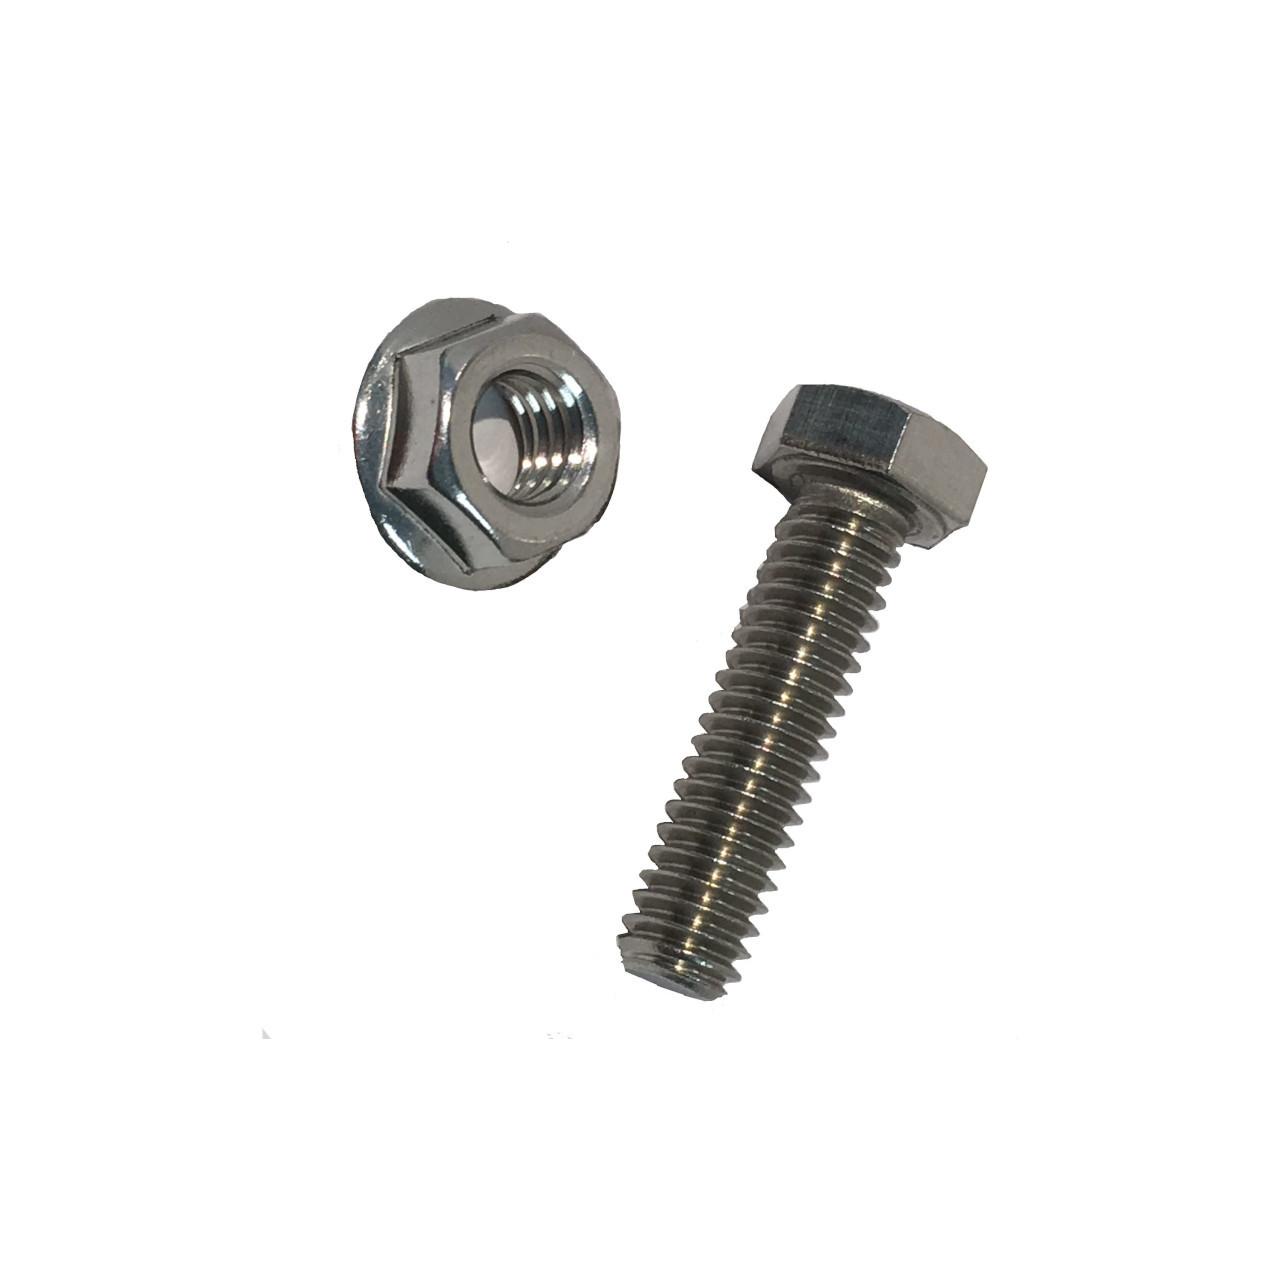 Roof-Tech - 5/16 Hex bolt & Flange nut